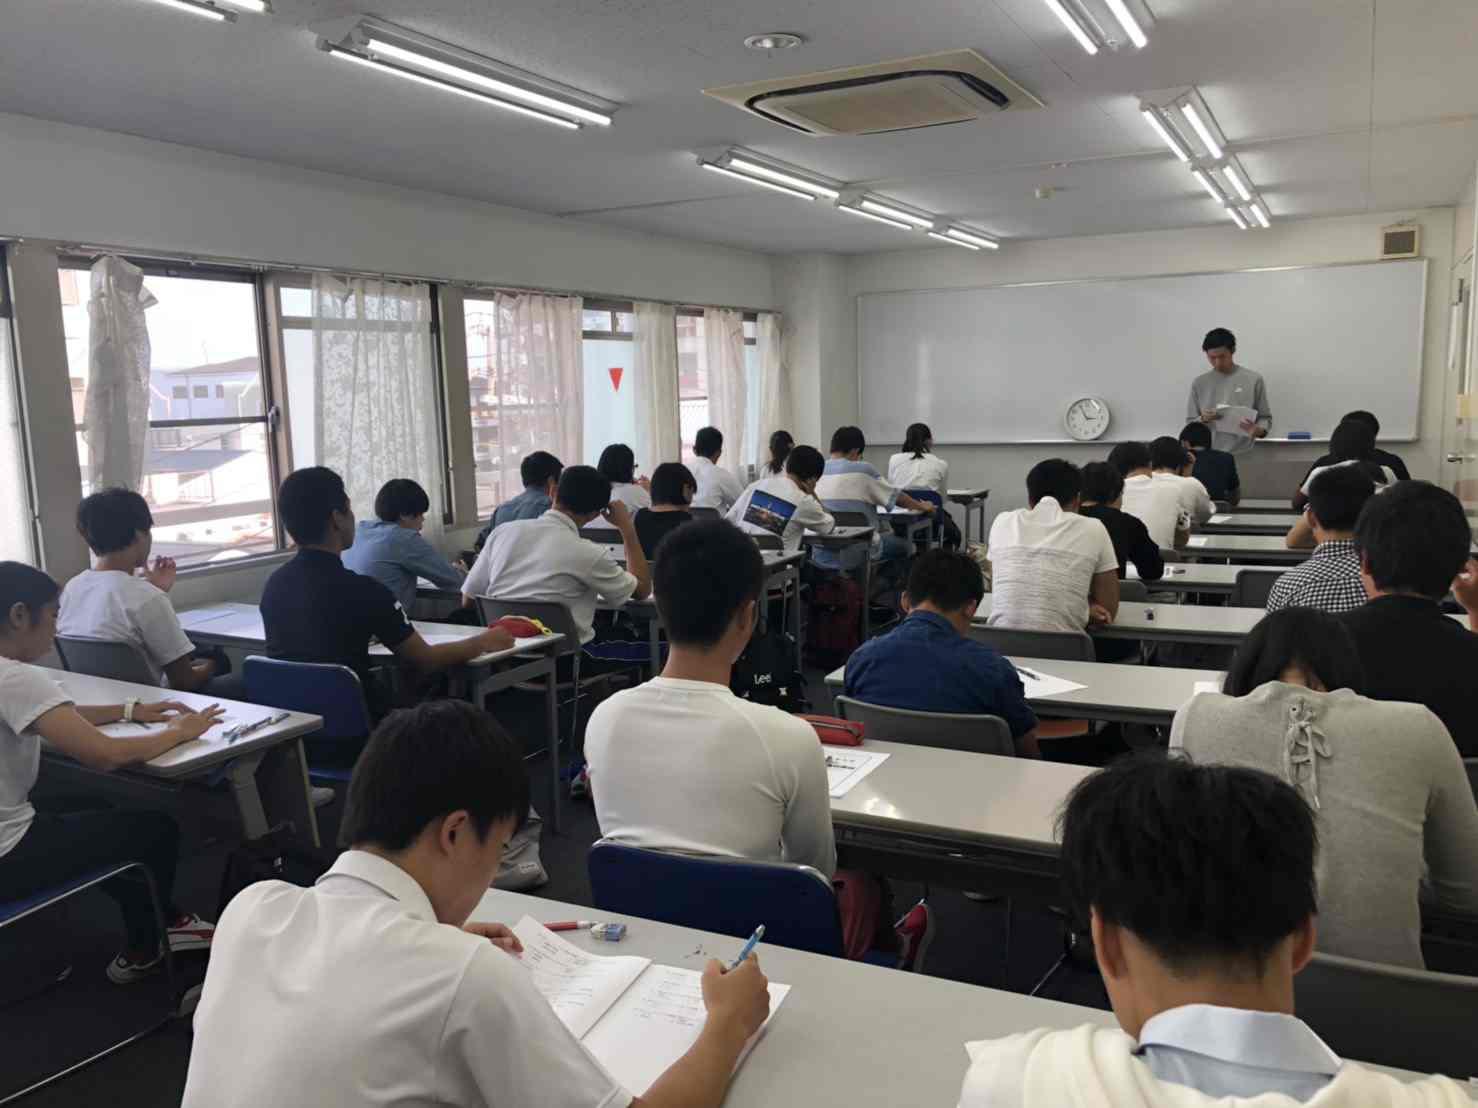 20180926ishikawa01.jpg